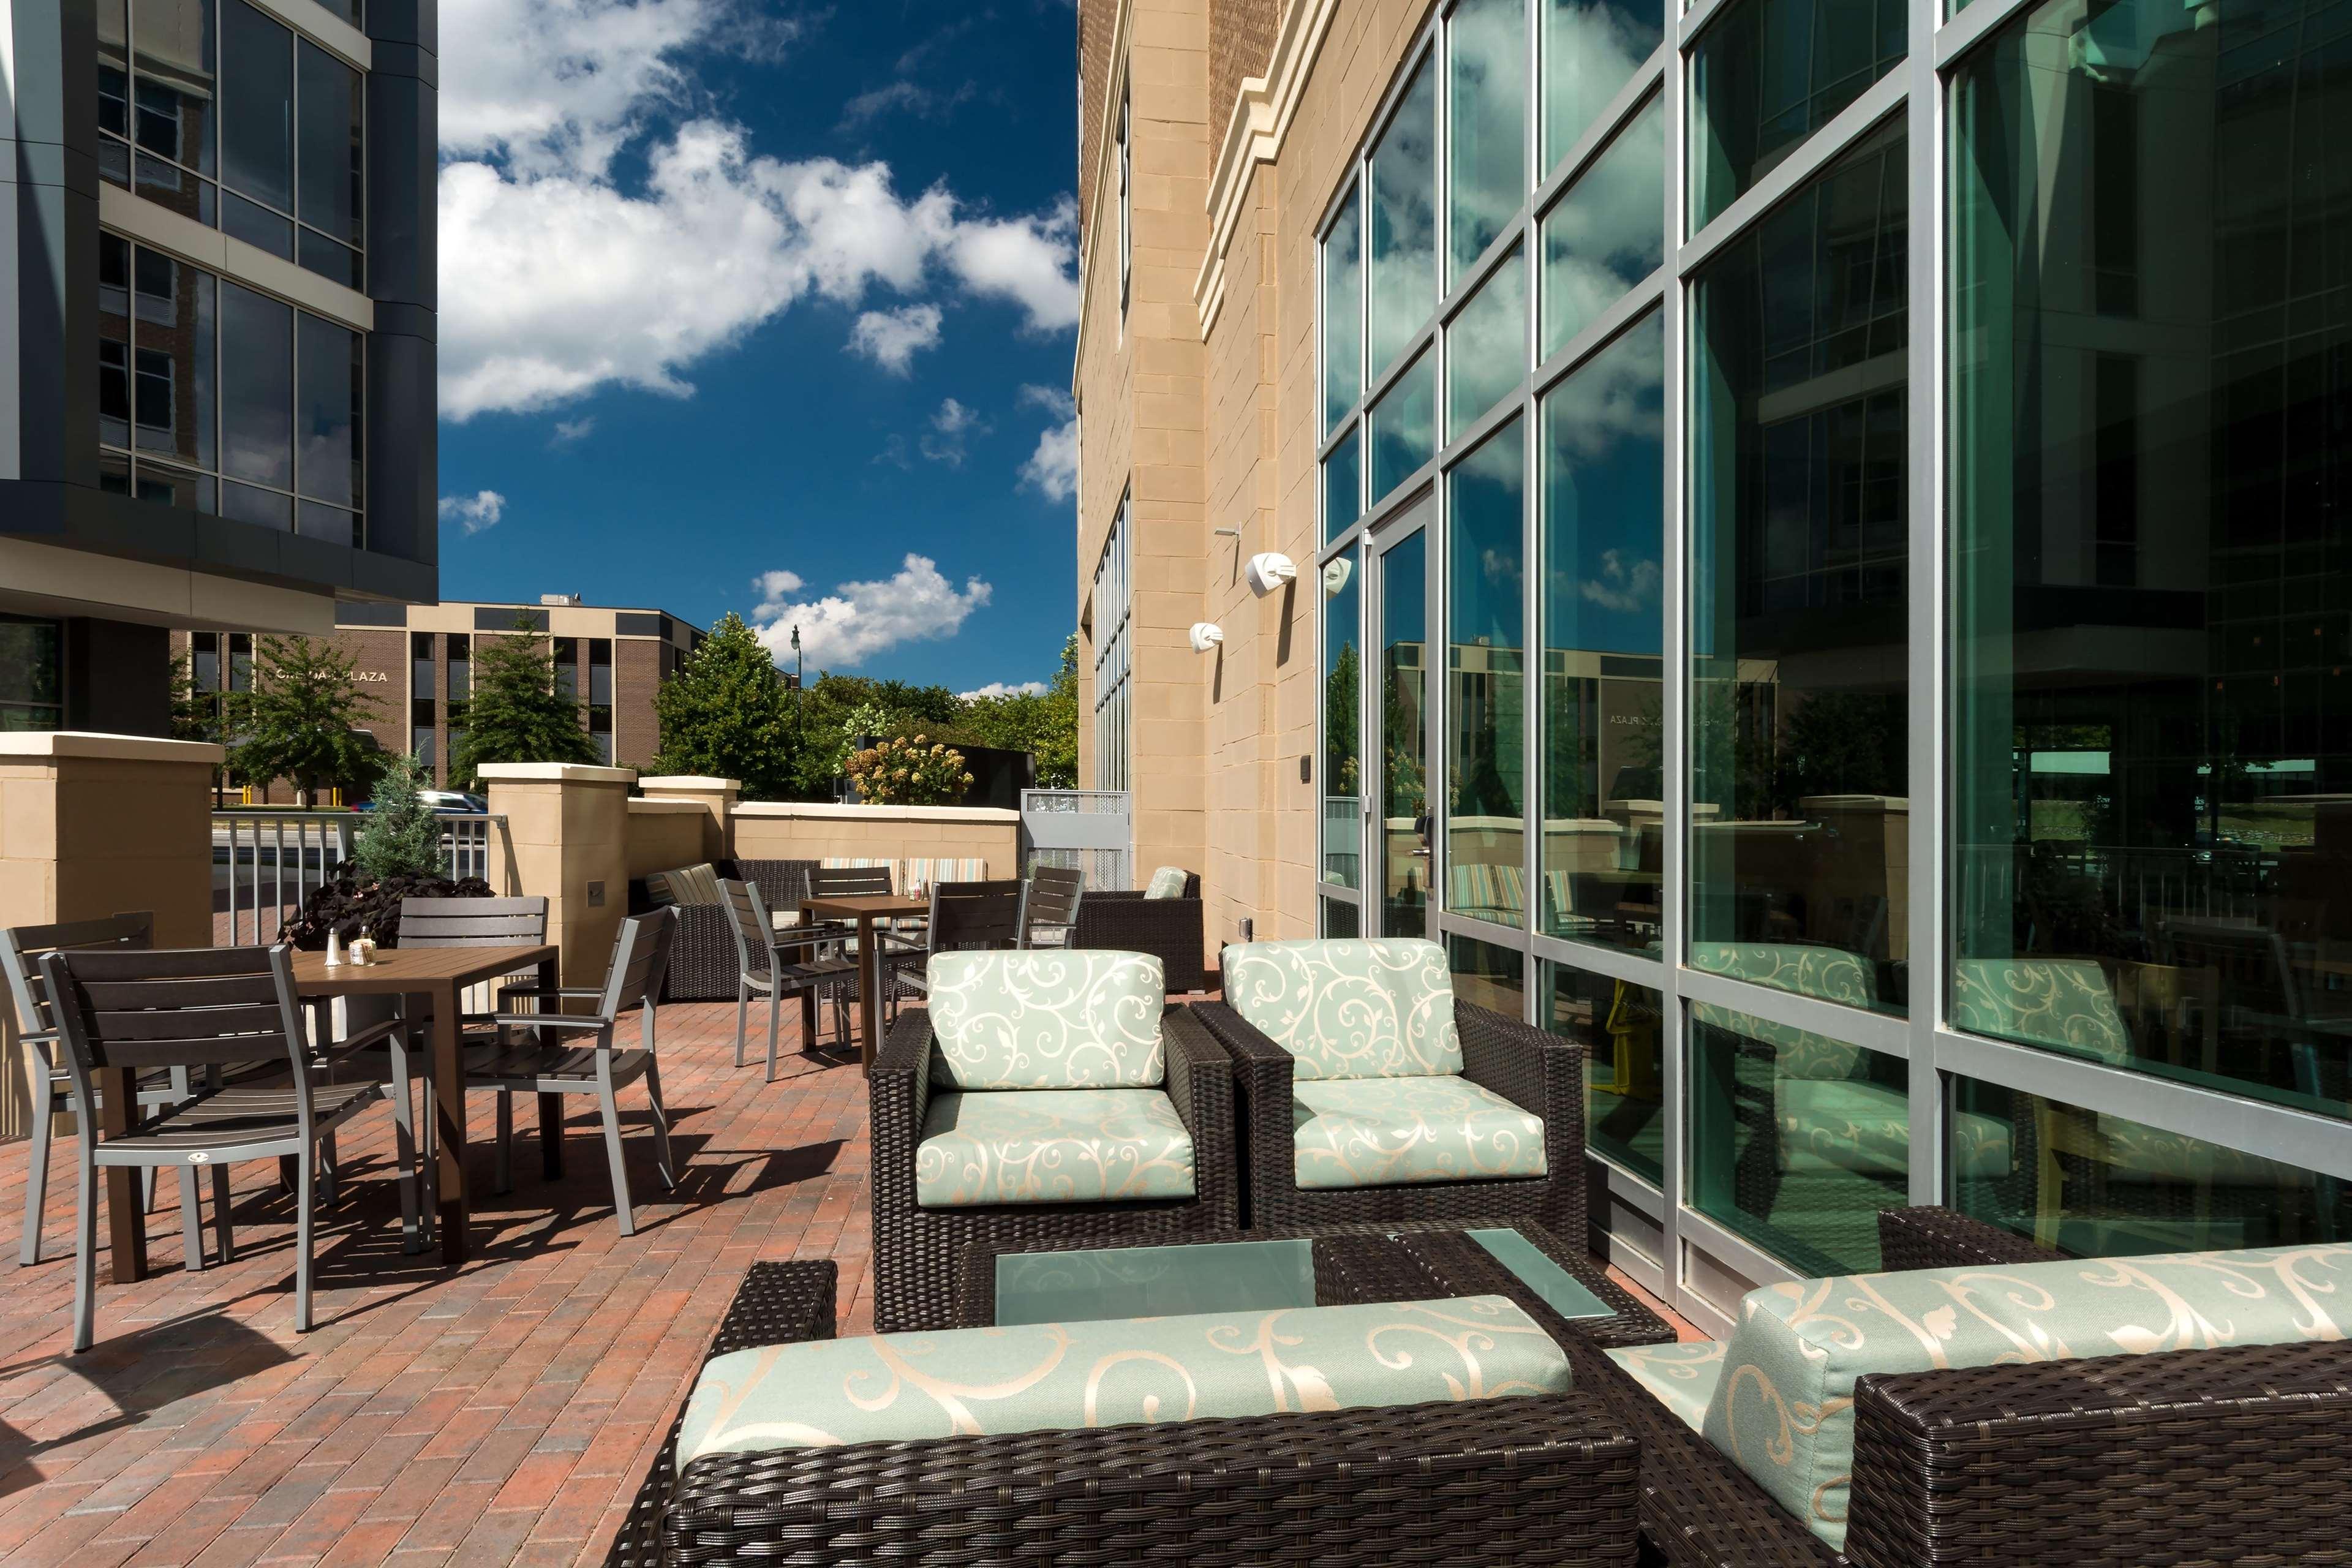 Hilton Garden Inn Asheville Downtown In Asheville Nc 28801